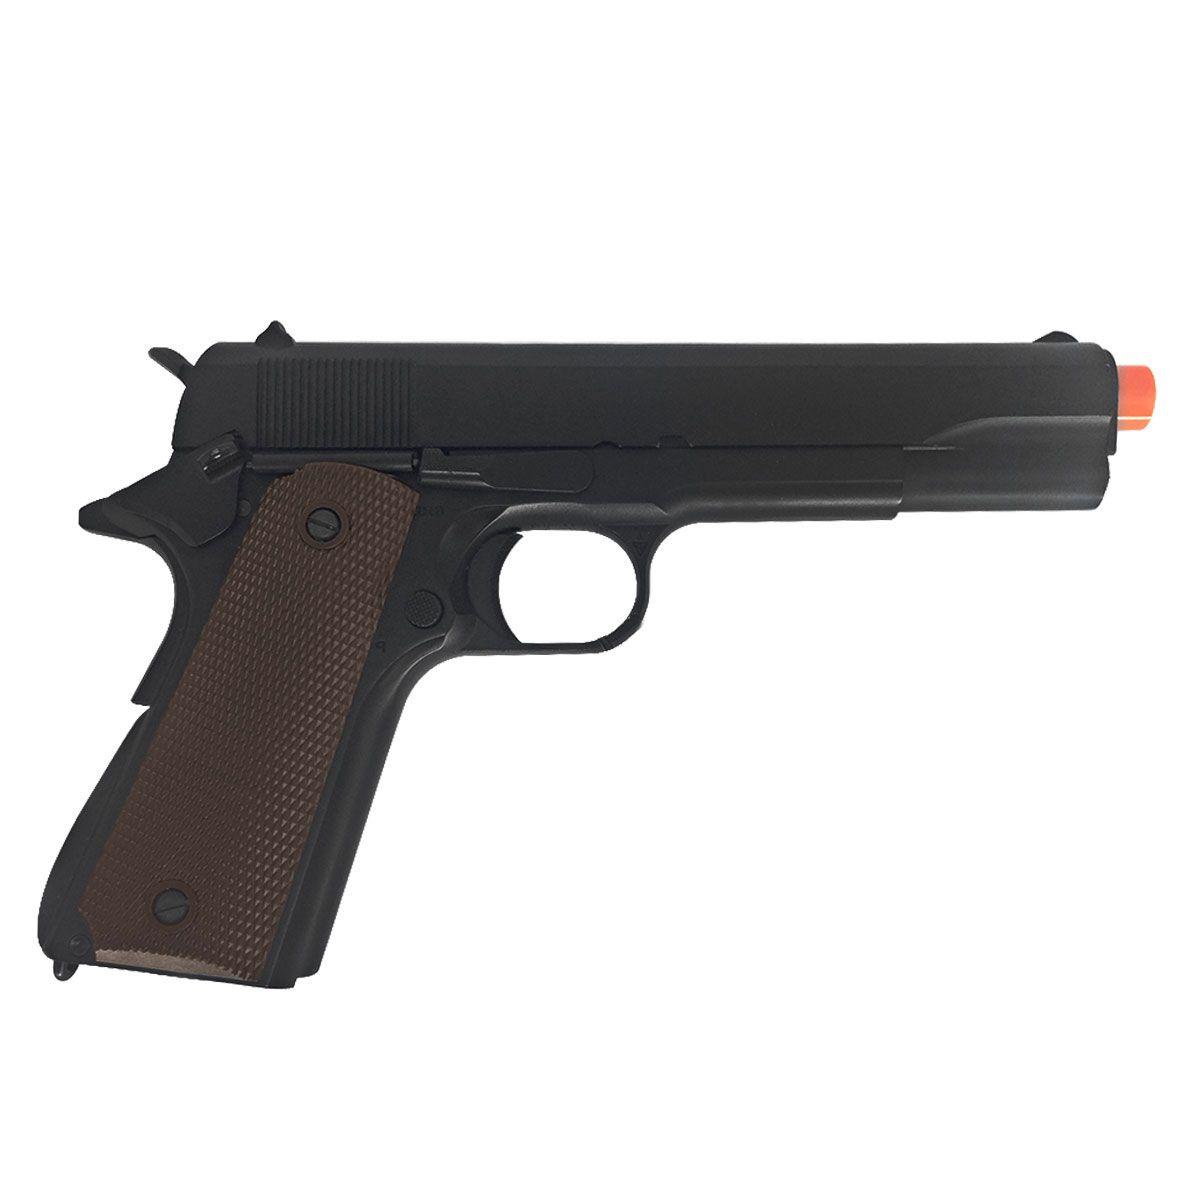 Pistola de Airsoft Army Armament M1911 A1 R31 Full Metal GBB